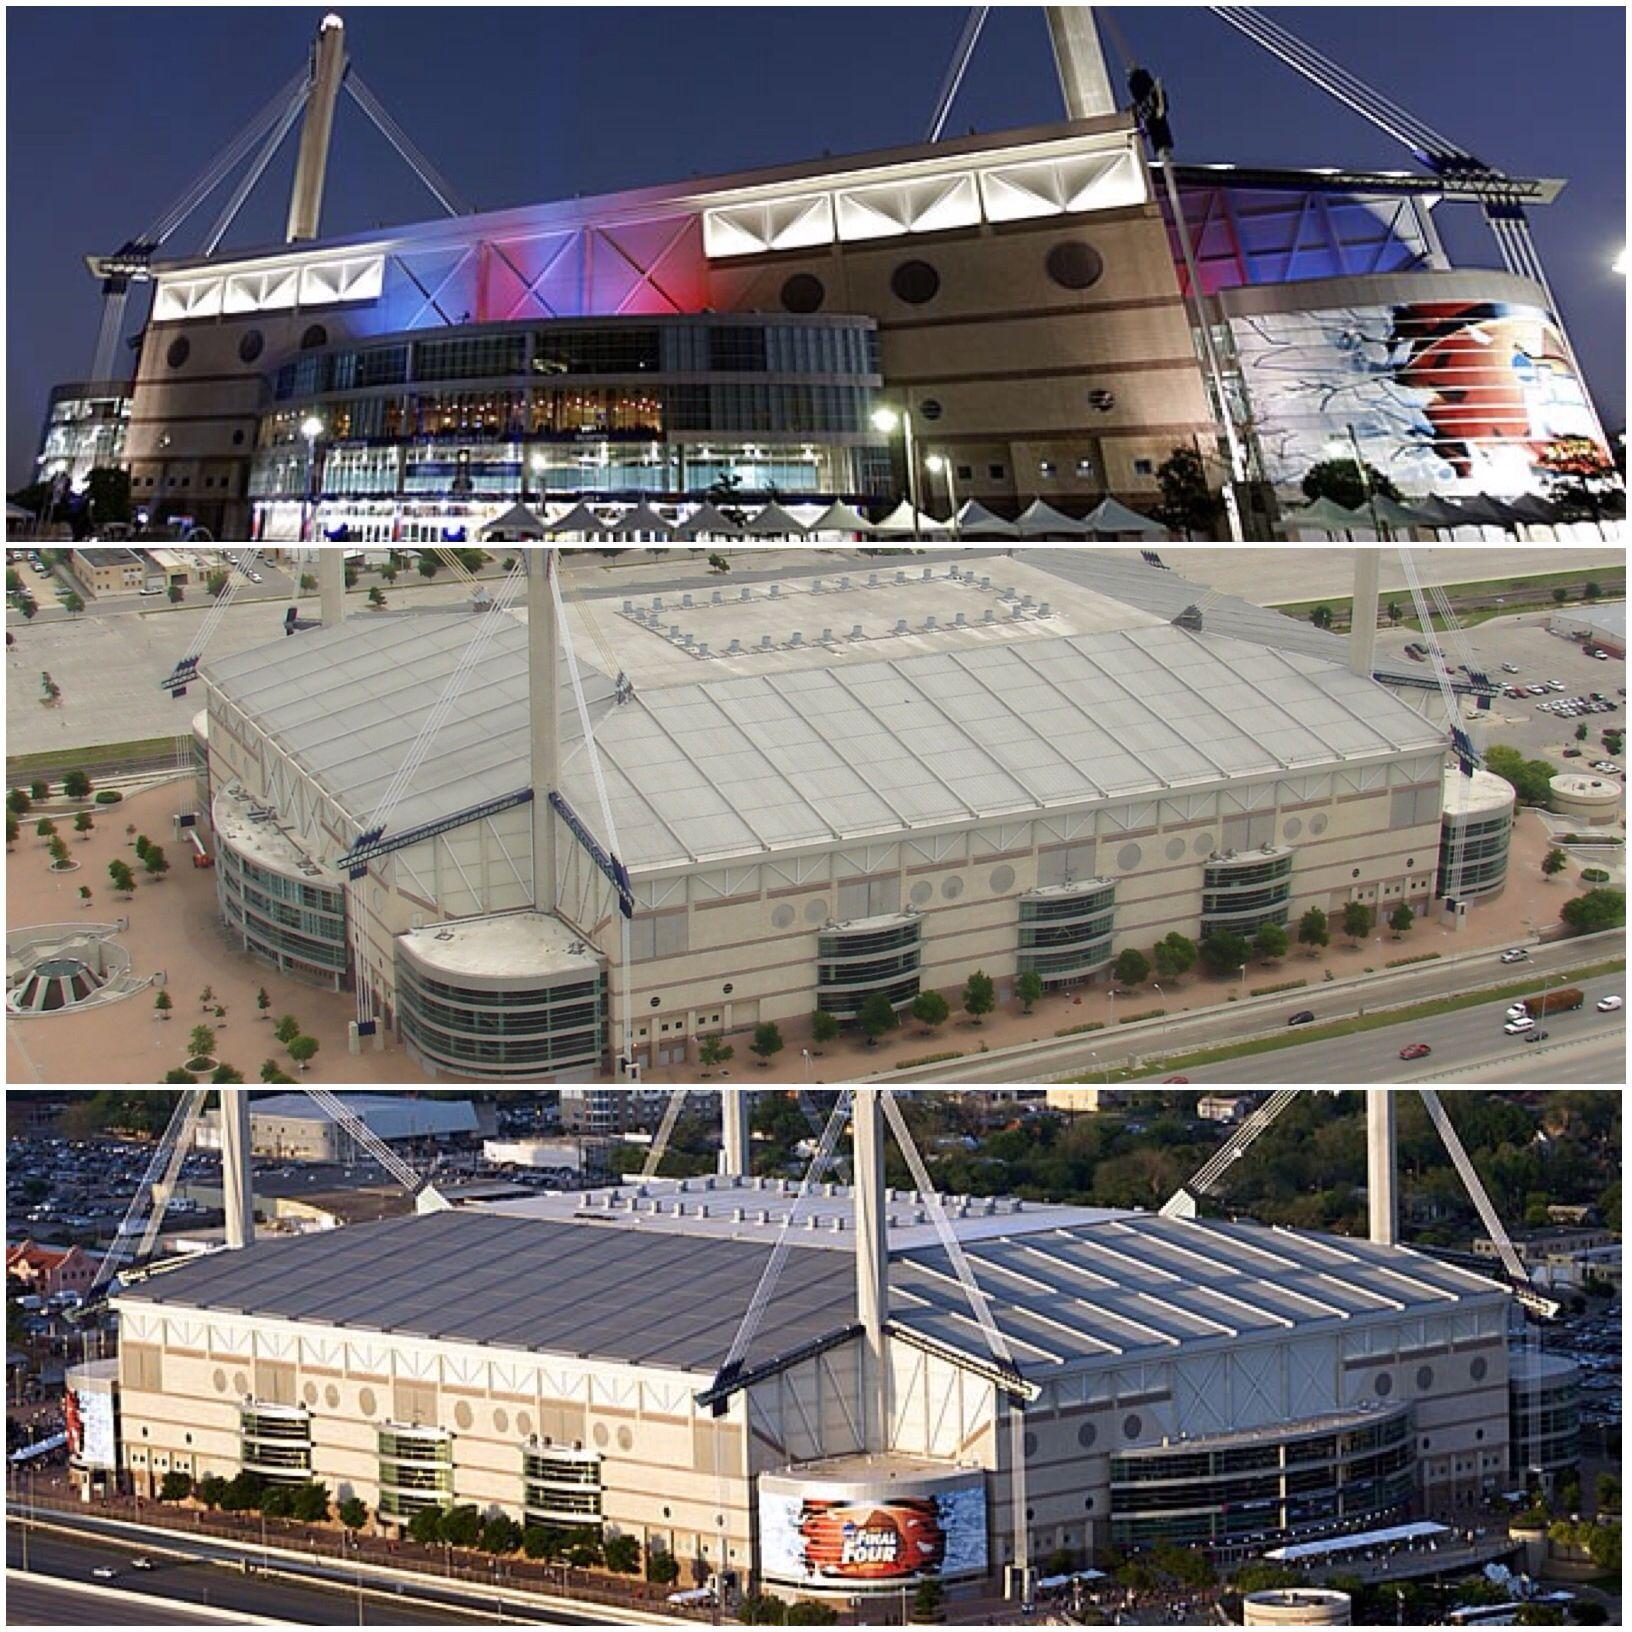 The Alamodome Is A Domed 65 000 Seat Multi Purpose Facility Used As A Football Basketball Stadium And Conv Downtown San Antonio San Antonio Spurs San Antonio